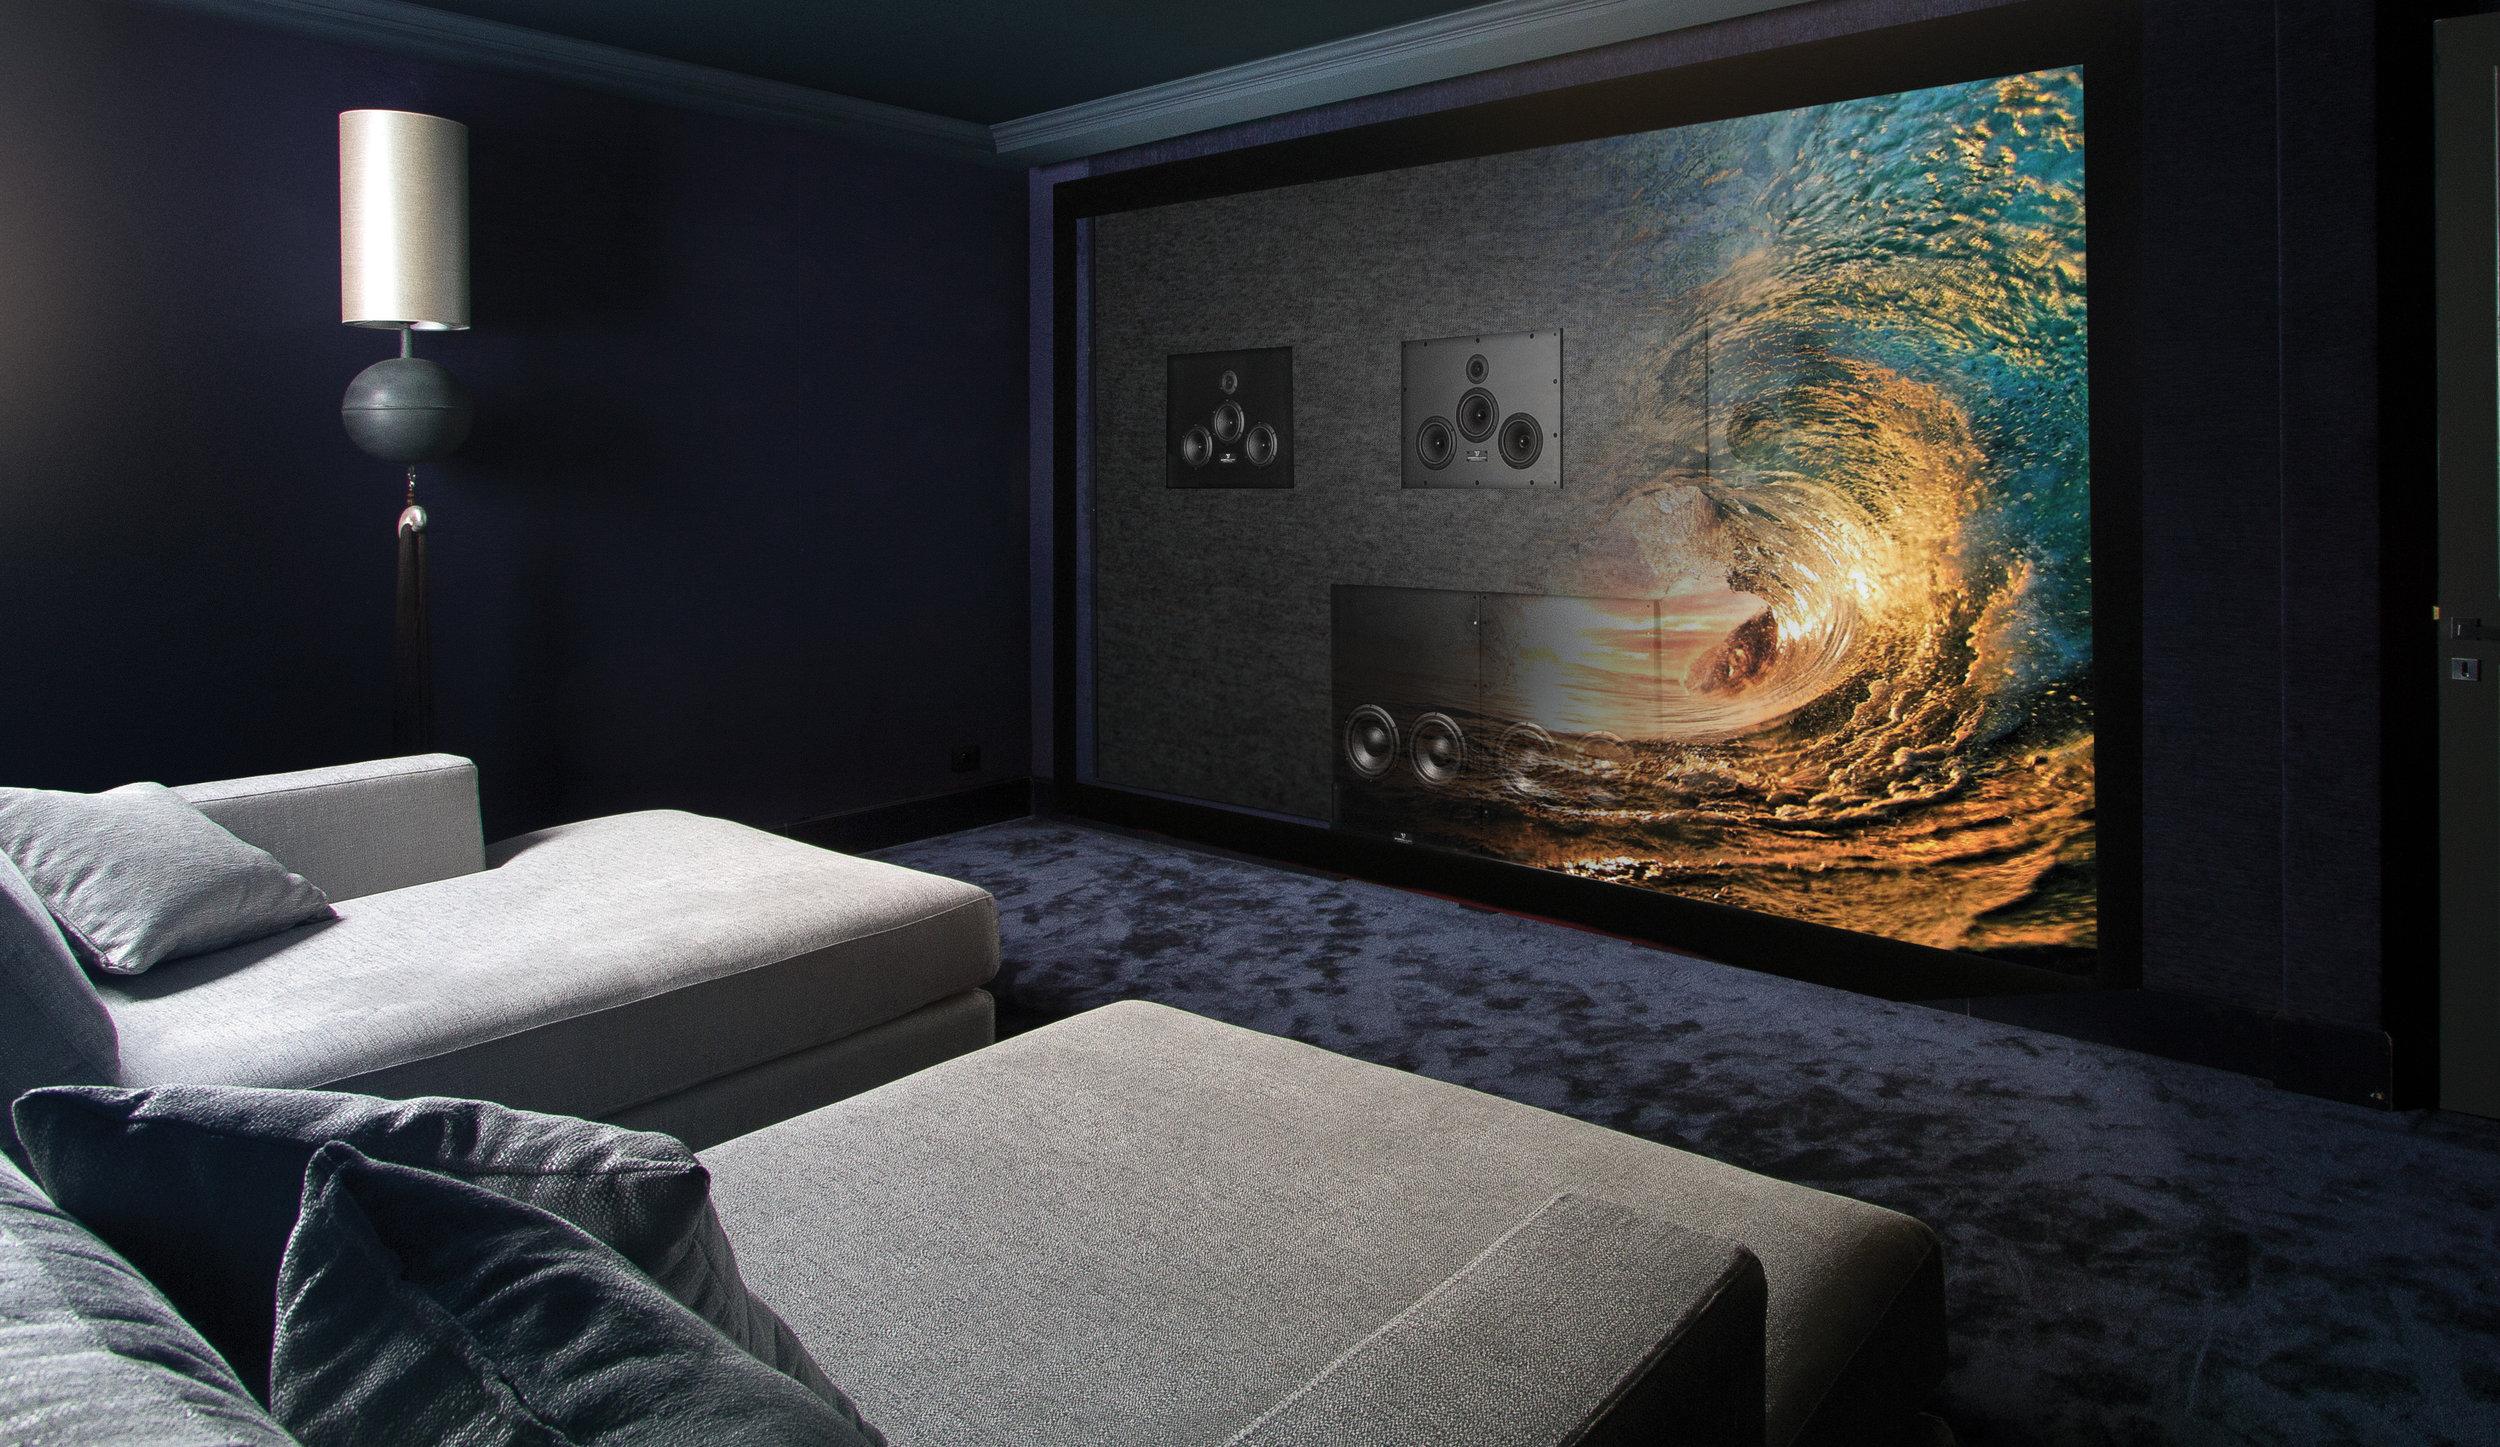 Waterfall_LCR_300_SUB_600_salle_de_cinéma_Grimaud_parution_Grenoble_Cadre_HD_RVB.jpg